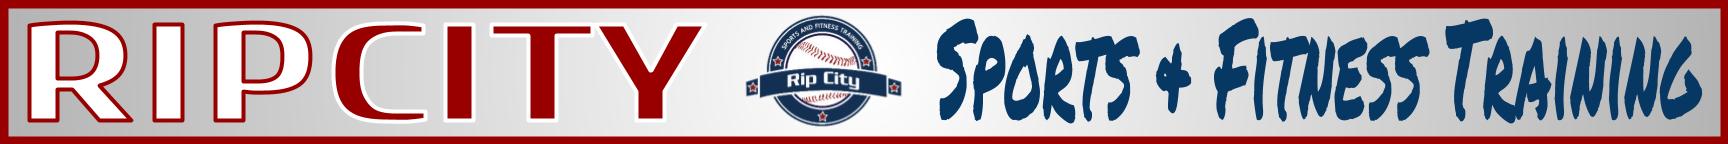 RipCity Banner.png